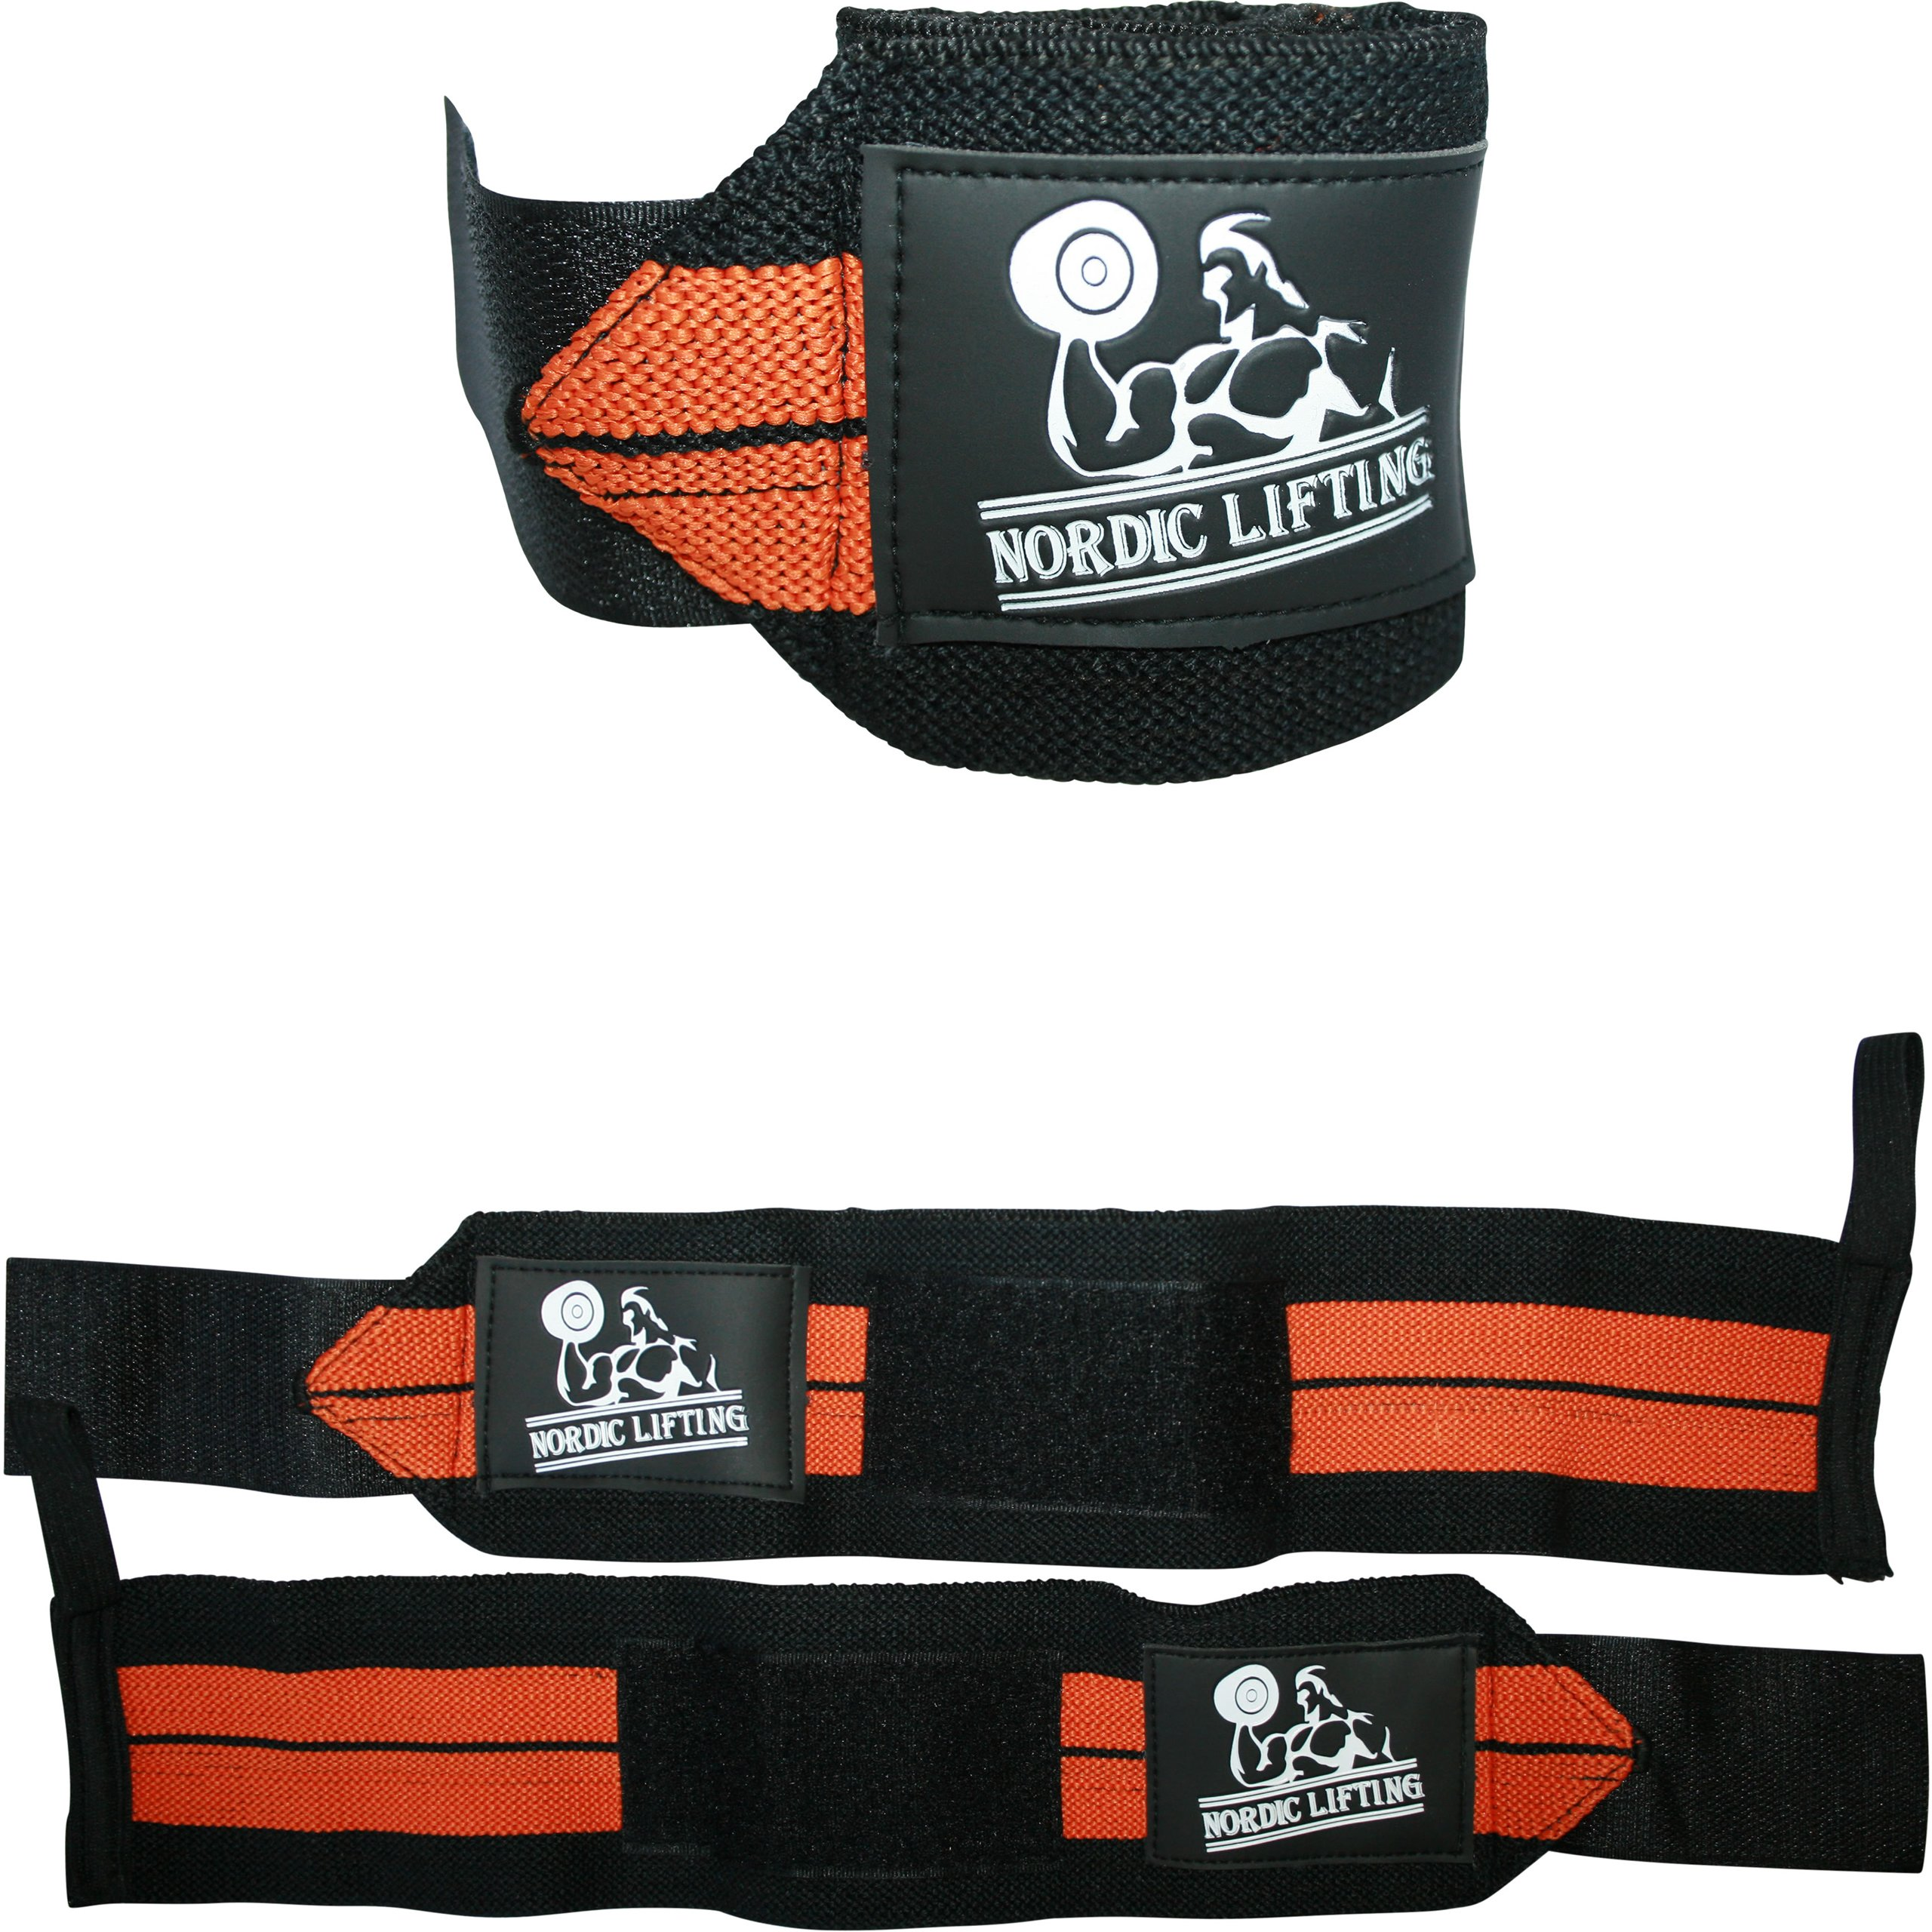 Wrist Wraps (1 Pair/2 Wraps) for Weightlifting/Cross Training/Powerlifting/Bodybuilding-Women & Men-Premium Quality Equipment & Accessories Avoid Injury During Weight Lifting-(Orange)-1 Year Warranty